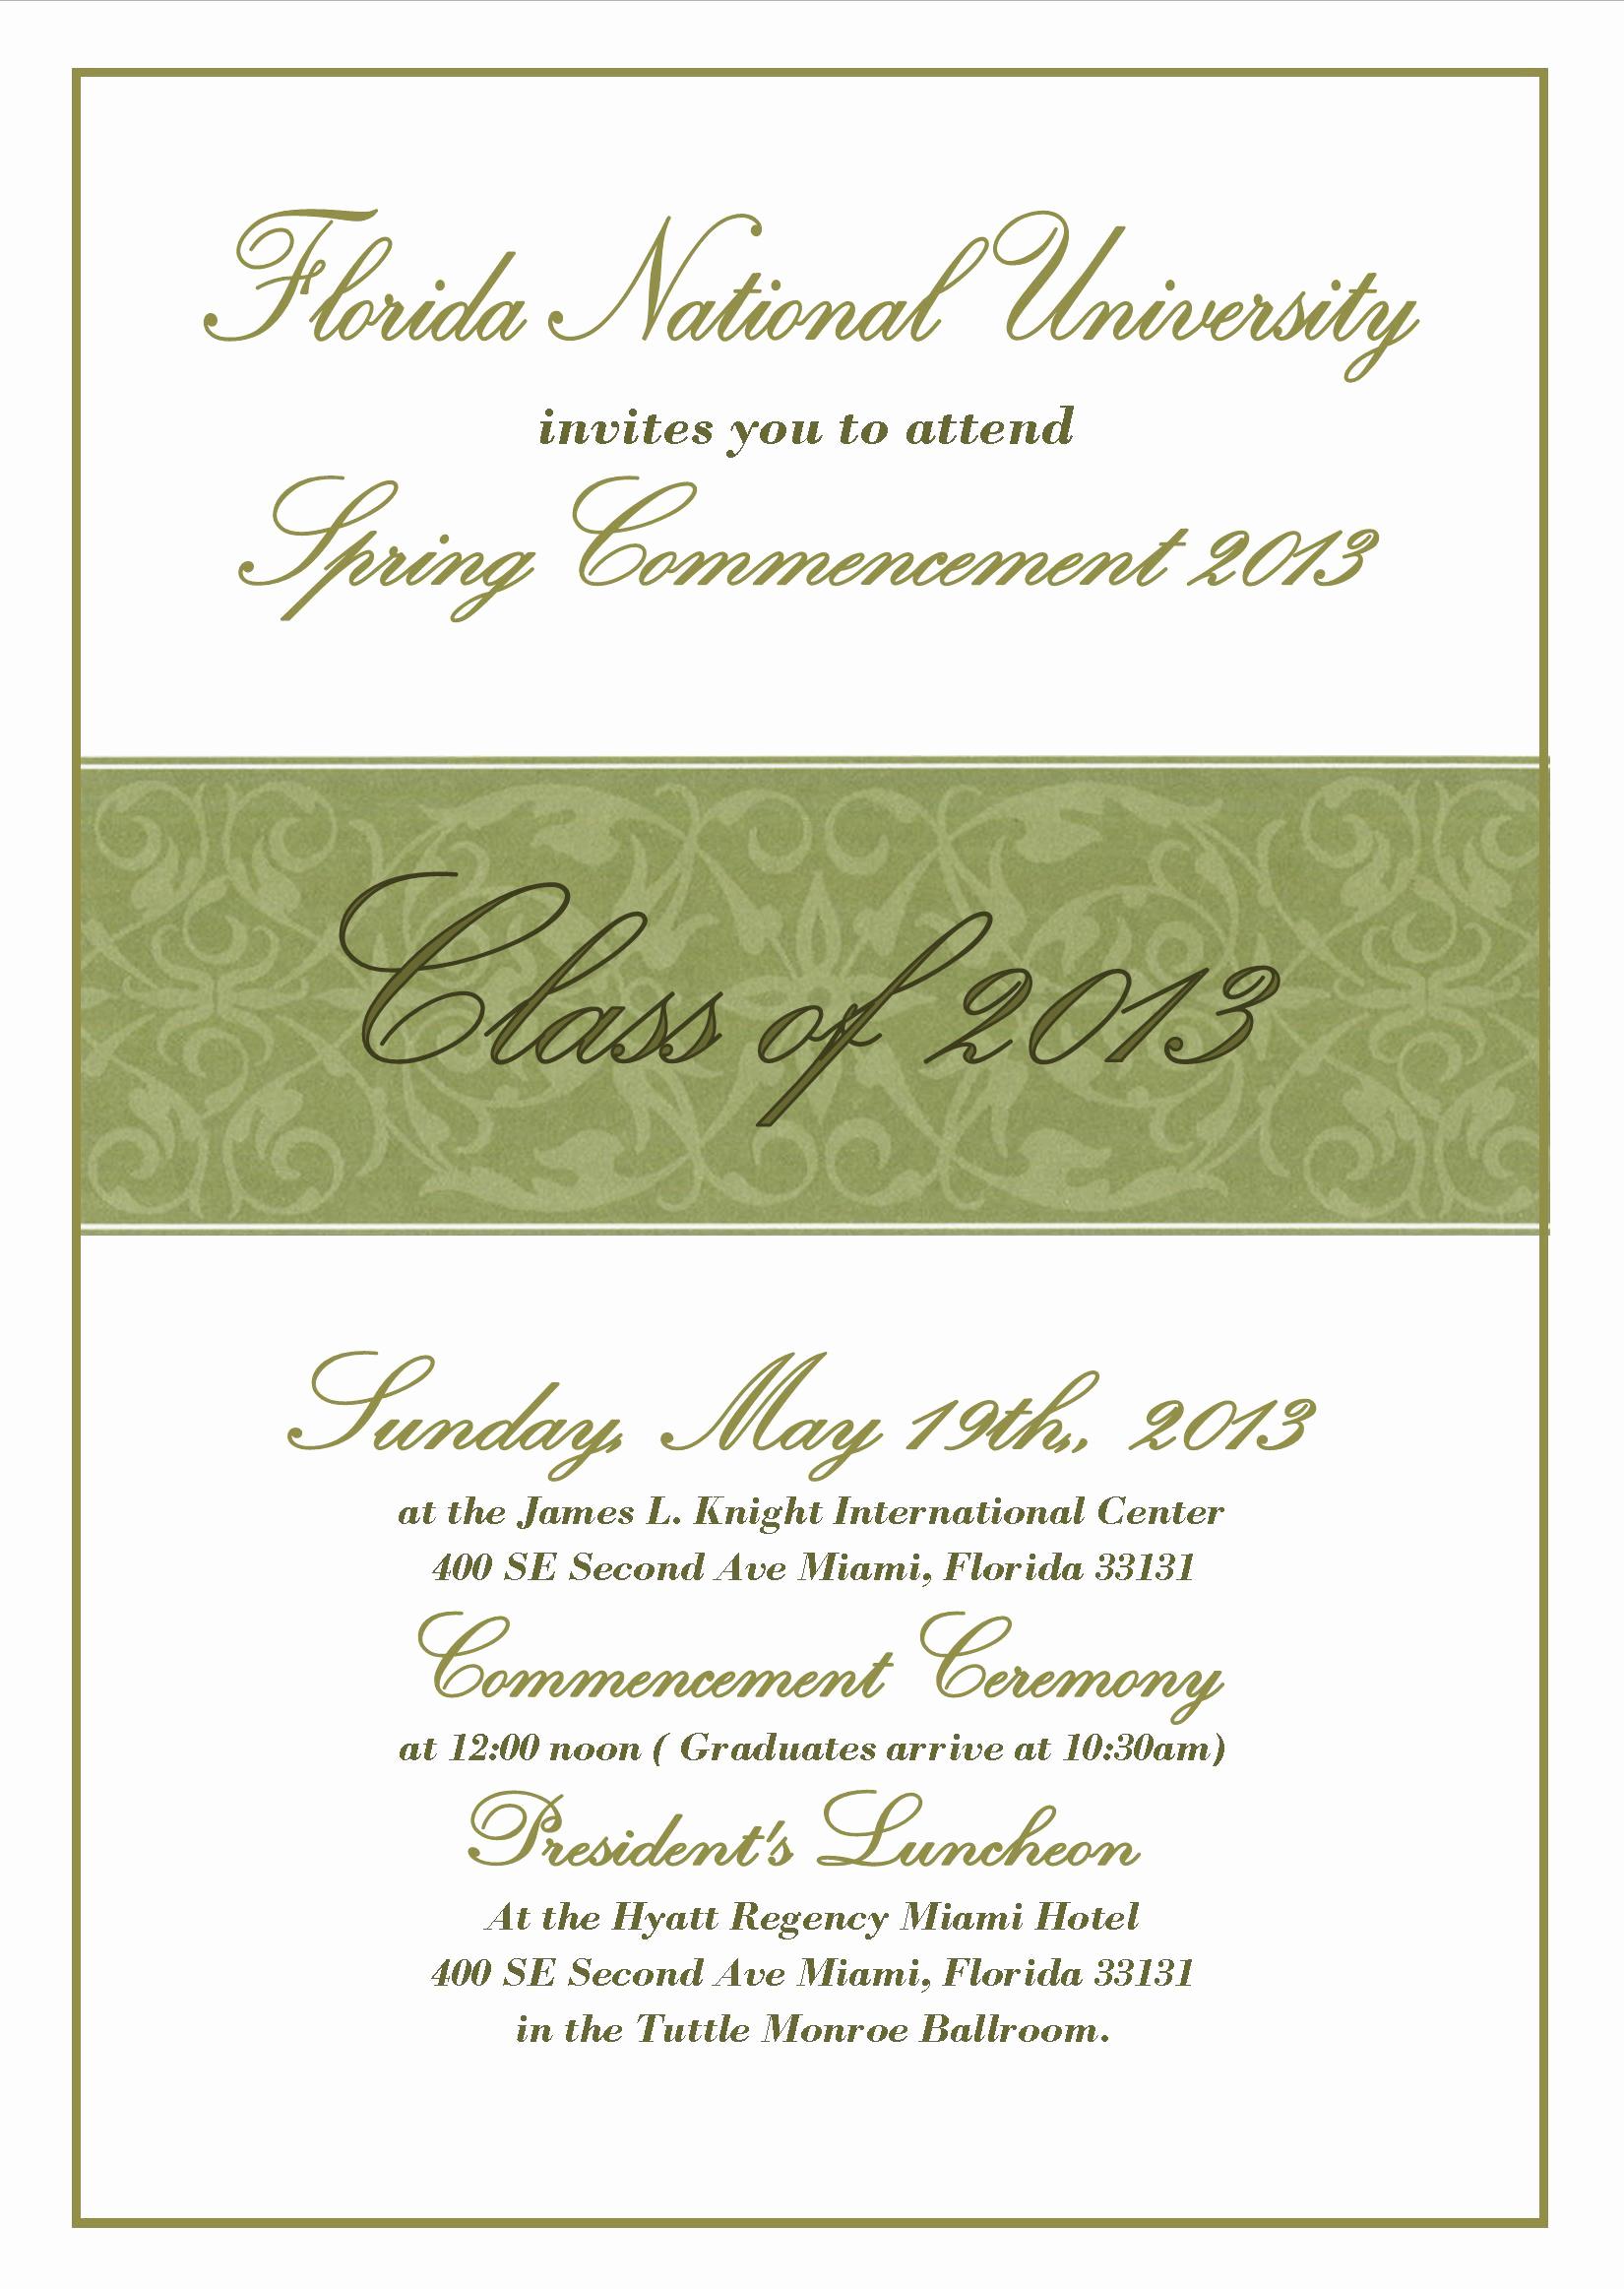 Invitation for Graduation Ceremony Unique Mencement Ceremony Invitation